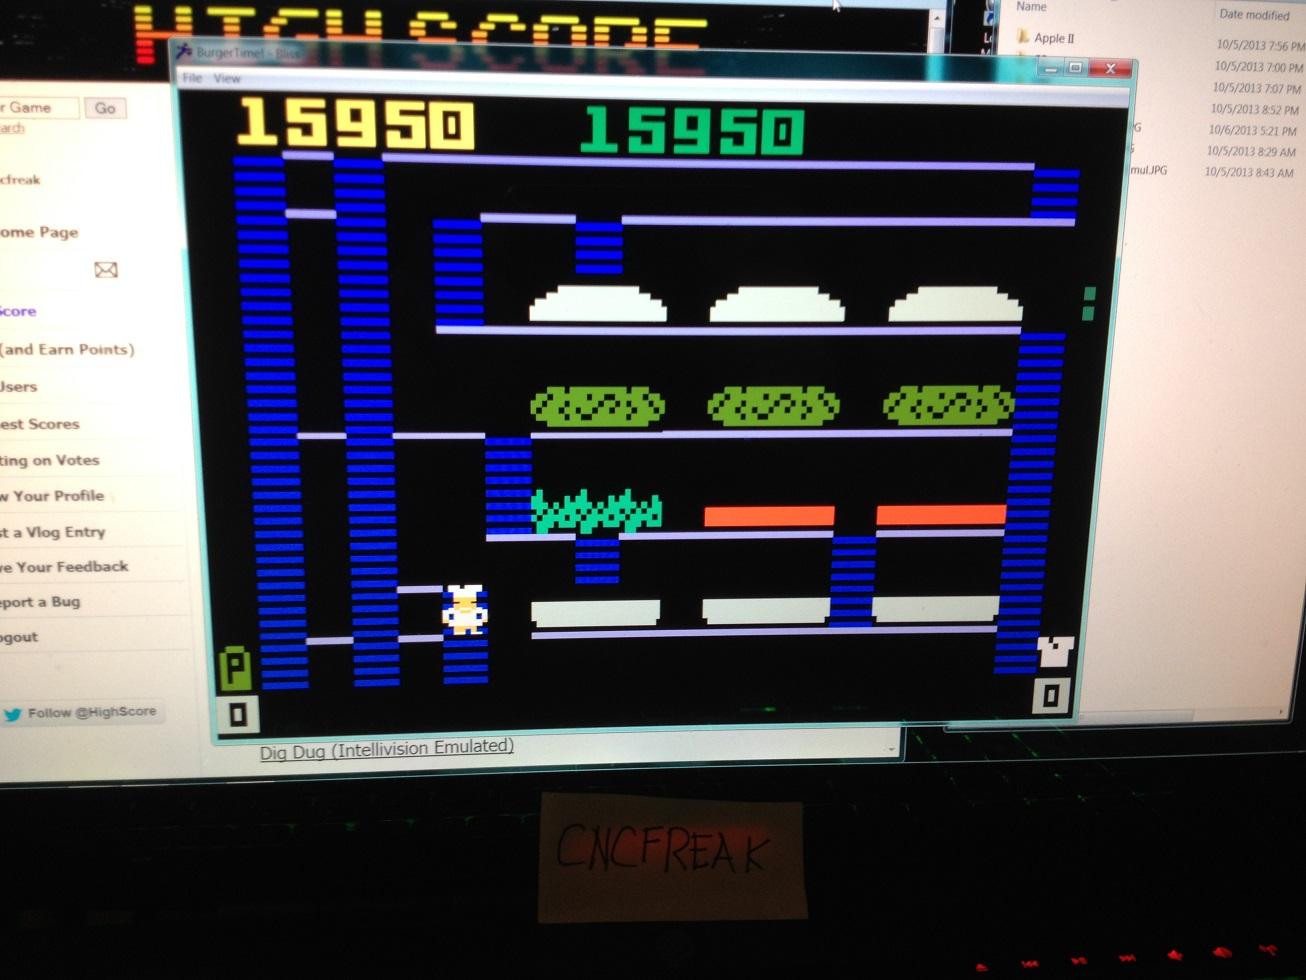 BurgerTime 15,950 points